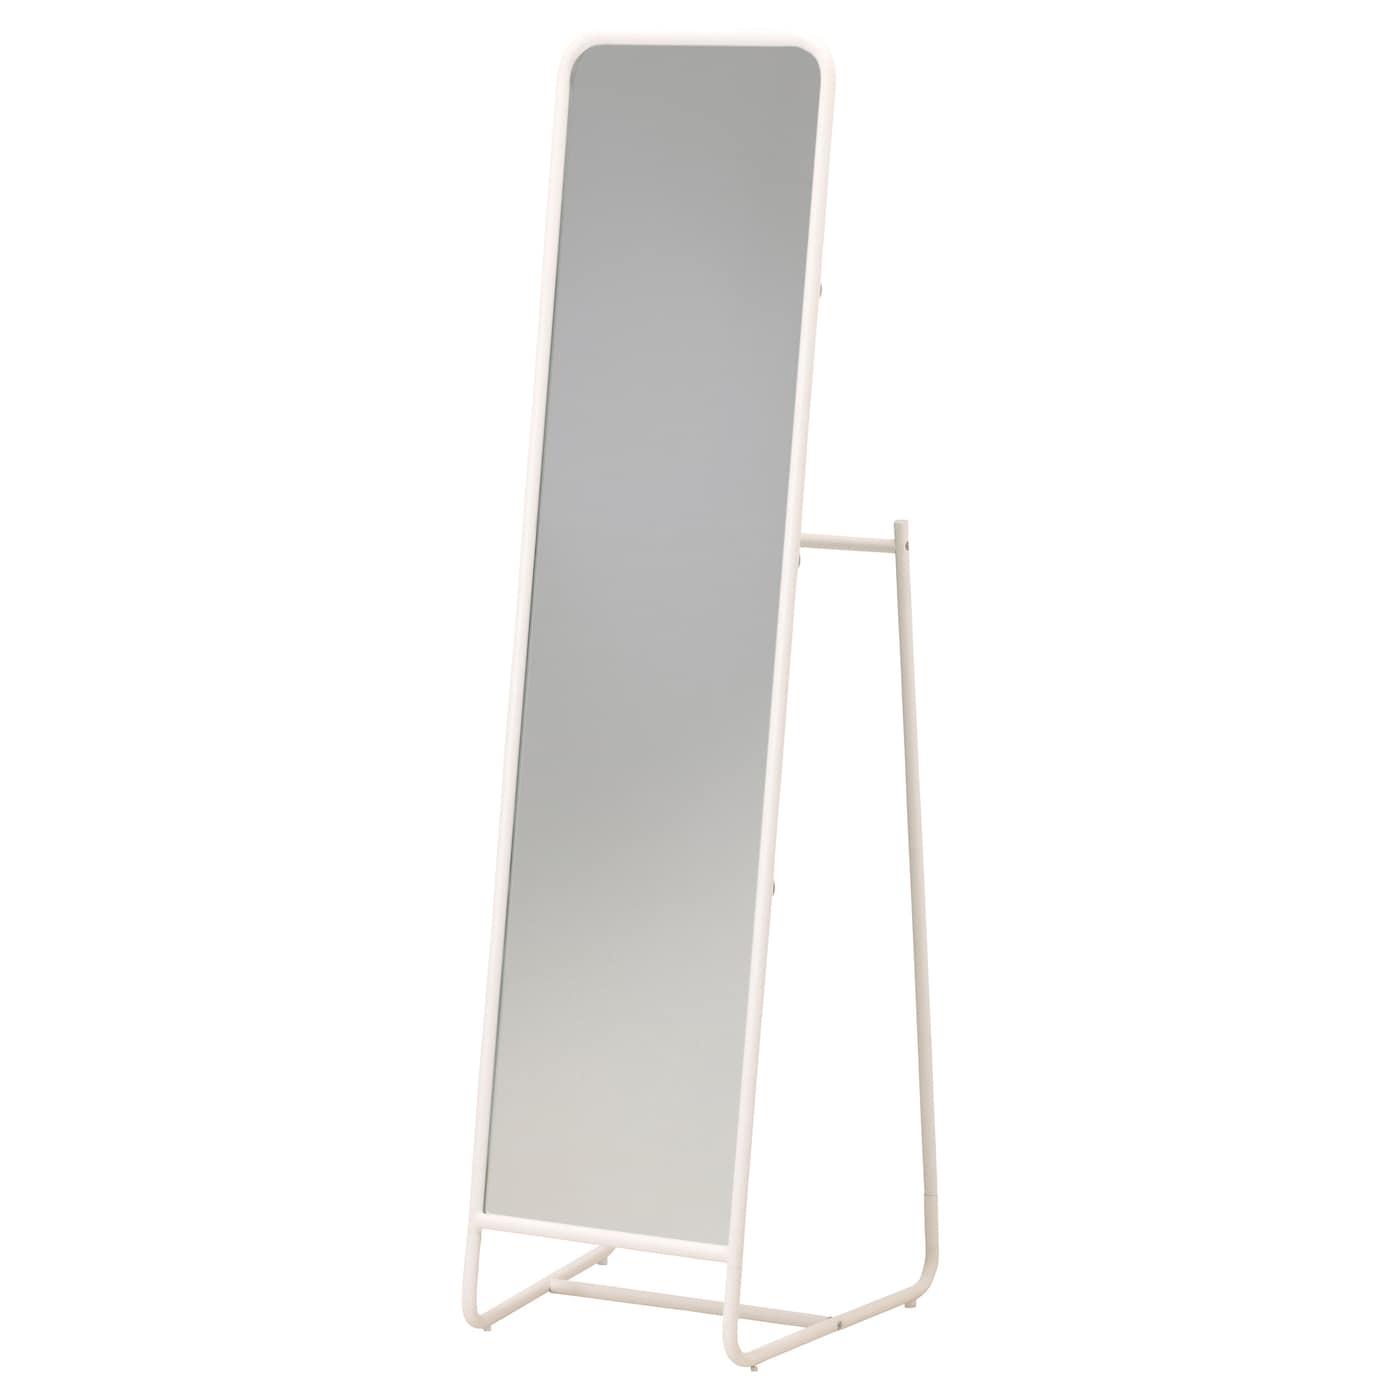 Miroir de chambre - Miroirs design - IKEA